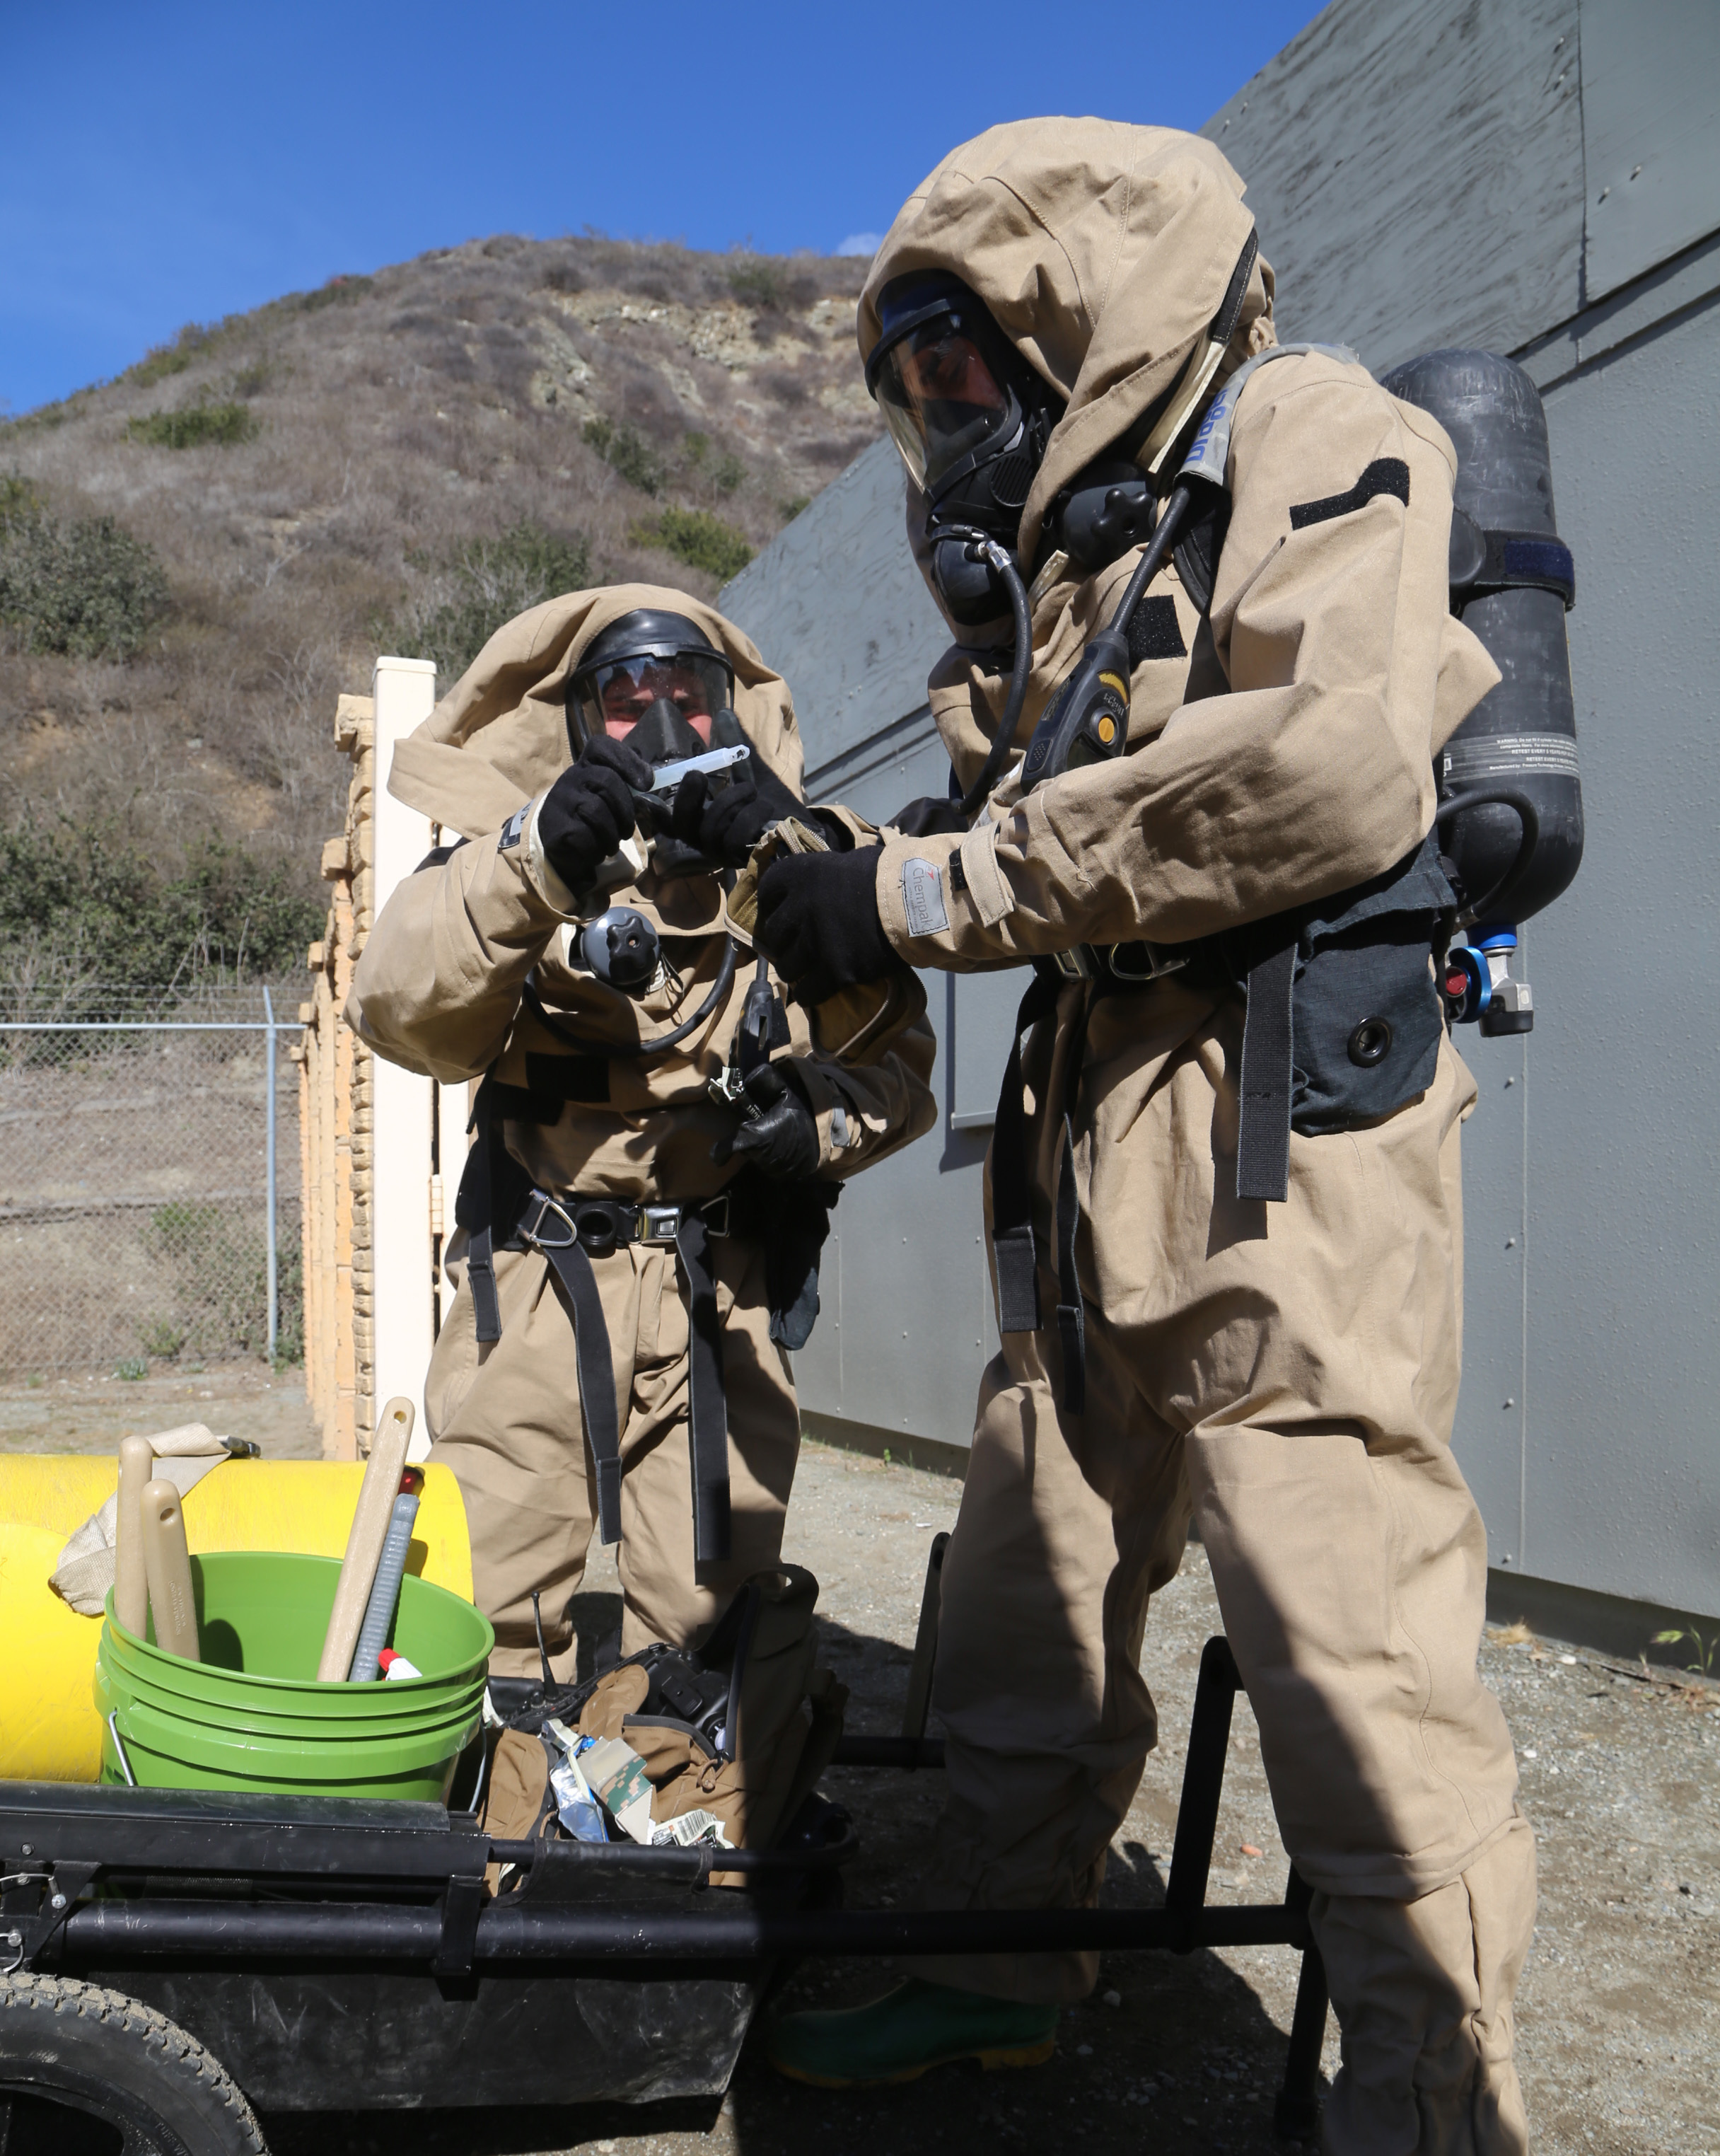 Camp Pendleton, California (7 February 2014) - SGT Jeffrey Fahrenbach and LCPL Matthew Streitenberger, CBRN Specialists with the 11th MEU, conduct CBRN Sensitive Site Exploitation training. (Source: DVIDSHub.net, US Marine Corps Photo by CPL Demetrius Morgan)